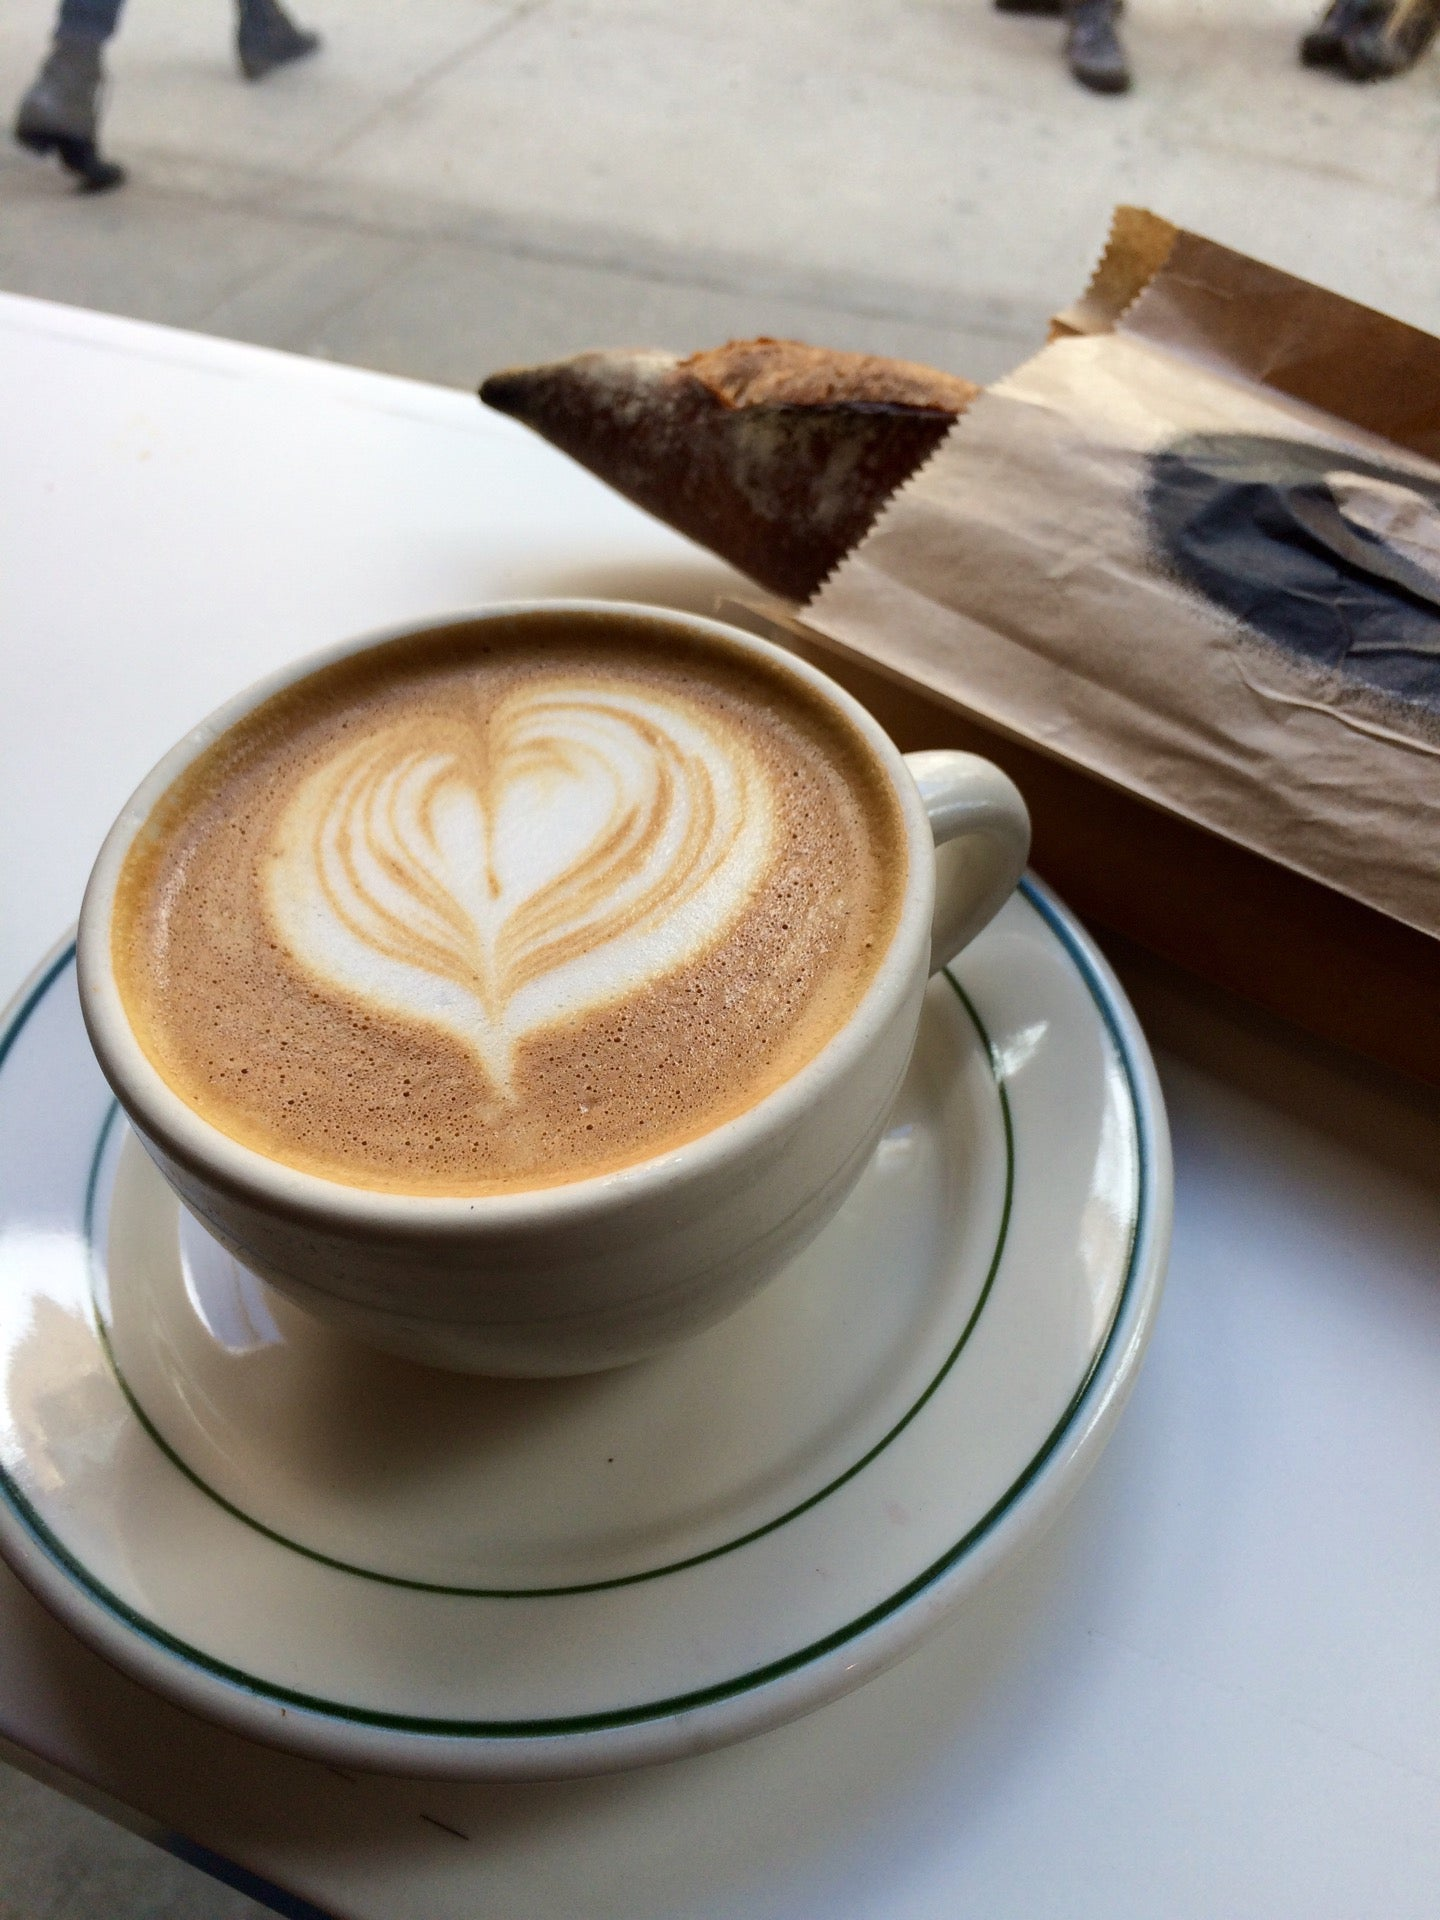 Everyman Espresso,aeropress,baristas,coffee,counter culture,east village,espresso,local milk,pour over,synesso